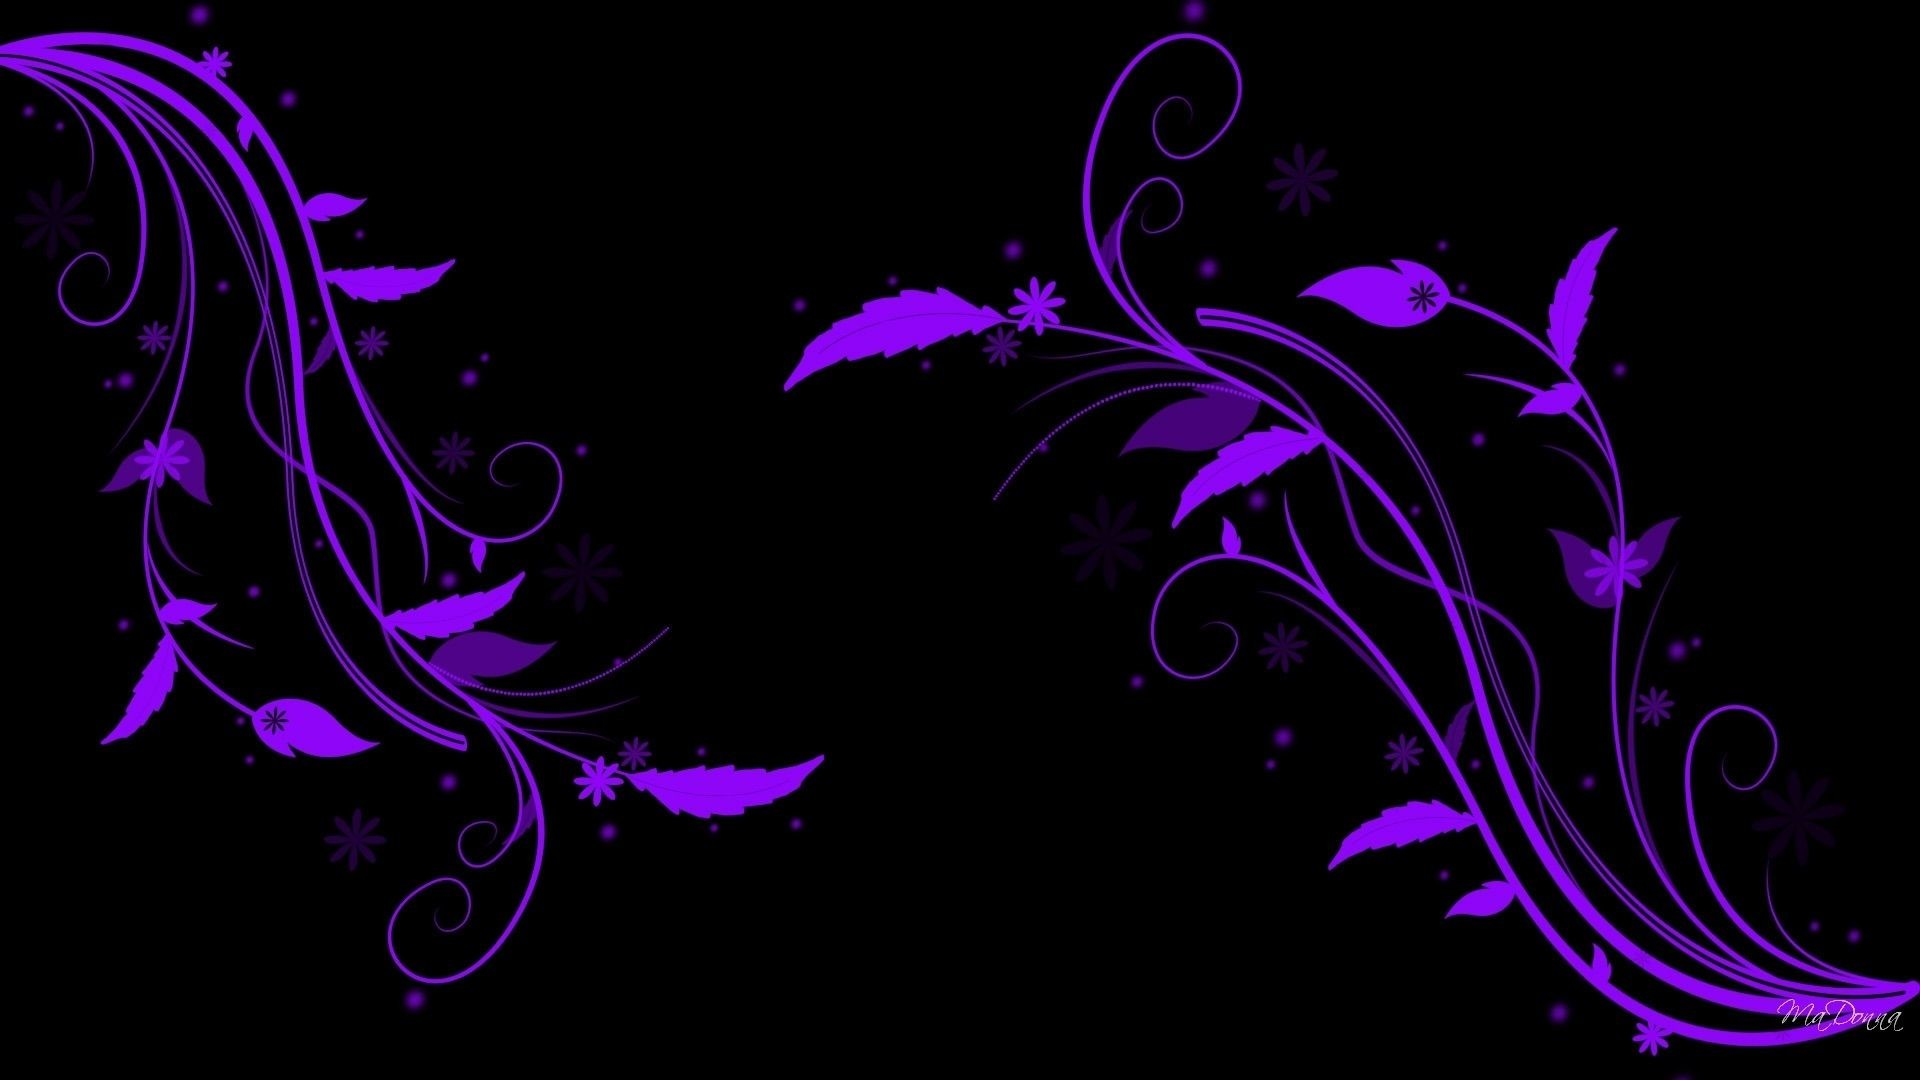 Purple Wallpapers 12 Best Wallpapers Collection Desktop: Lenovo Wallpaper 1366x768 (68+ Images